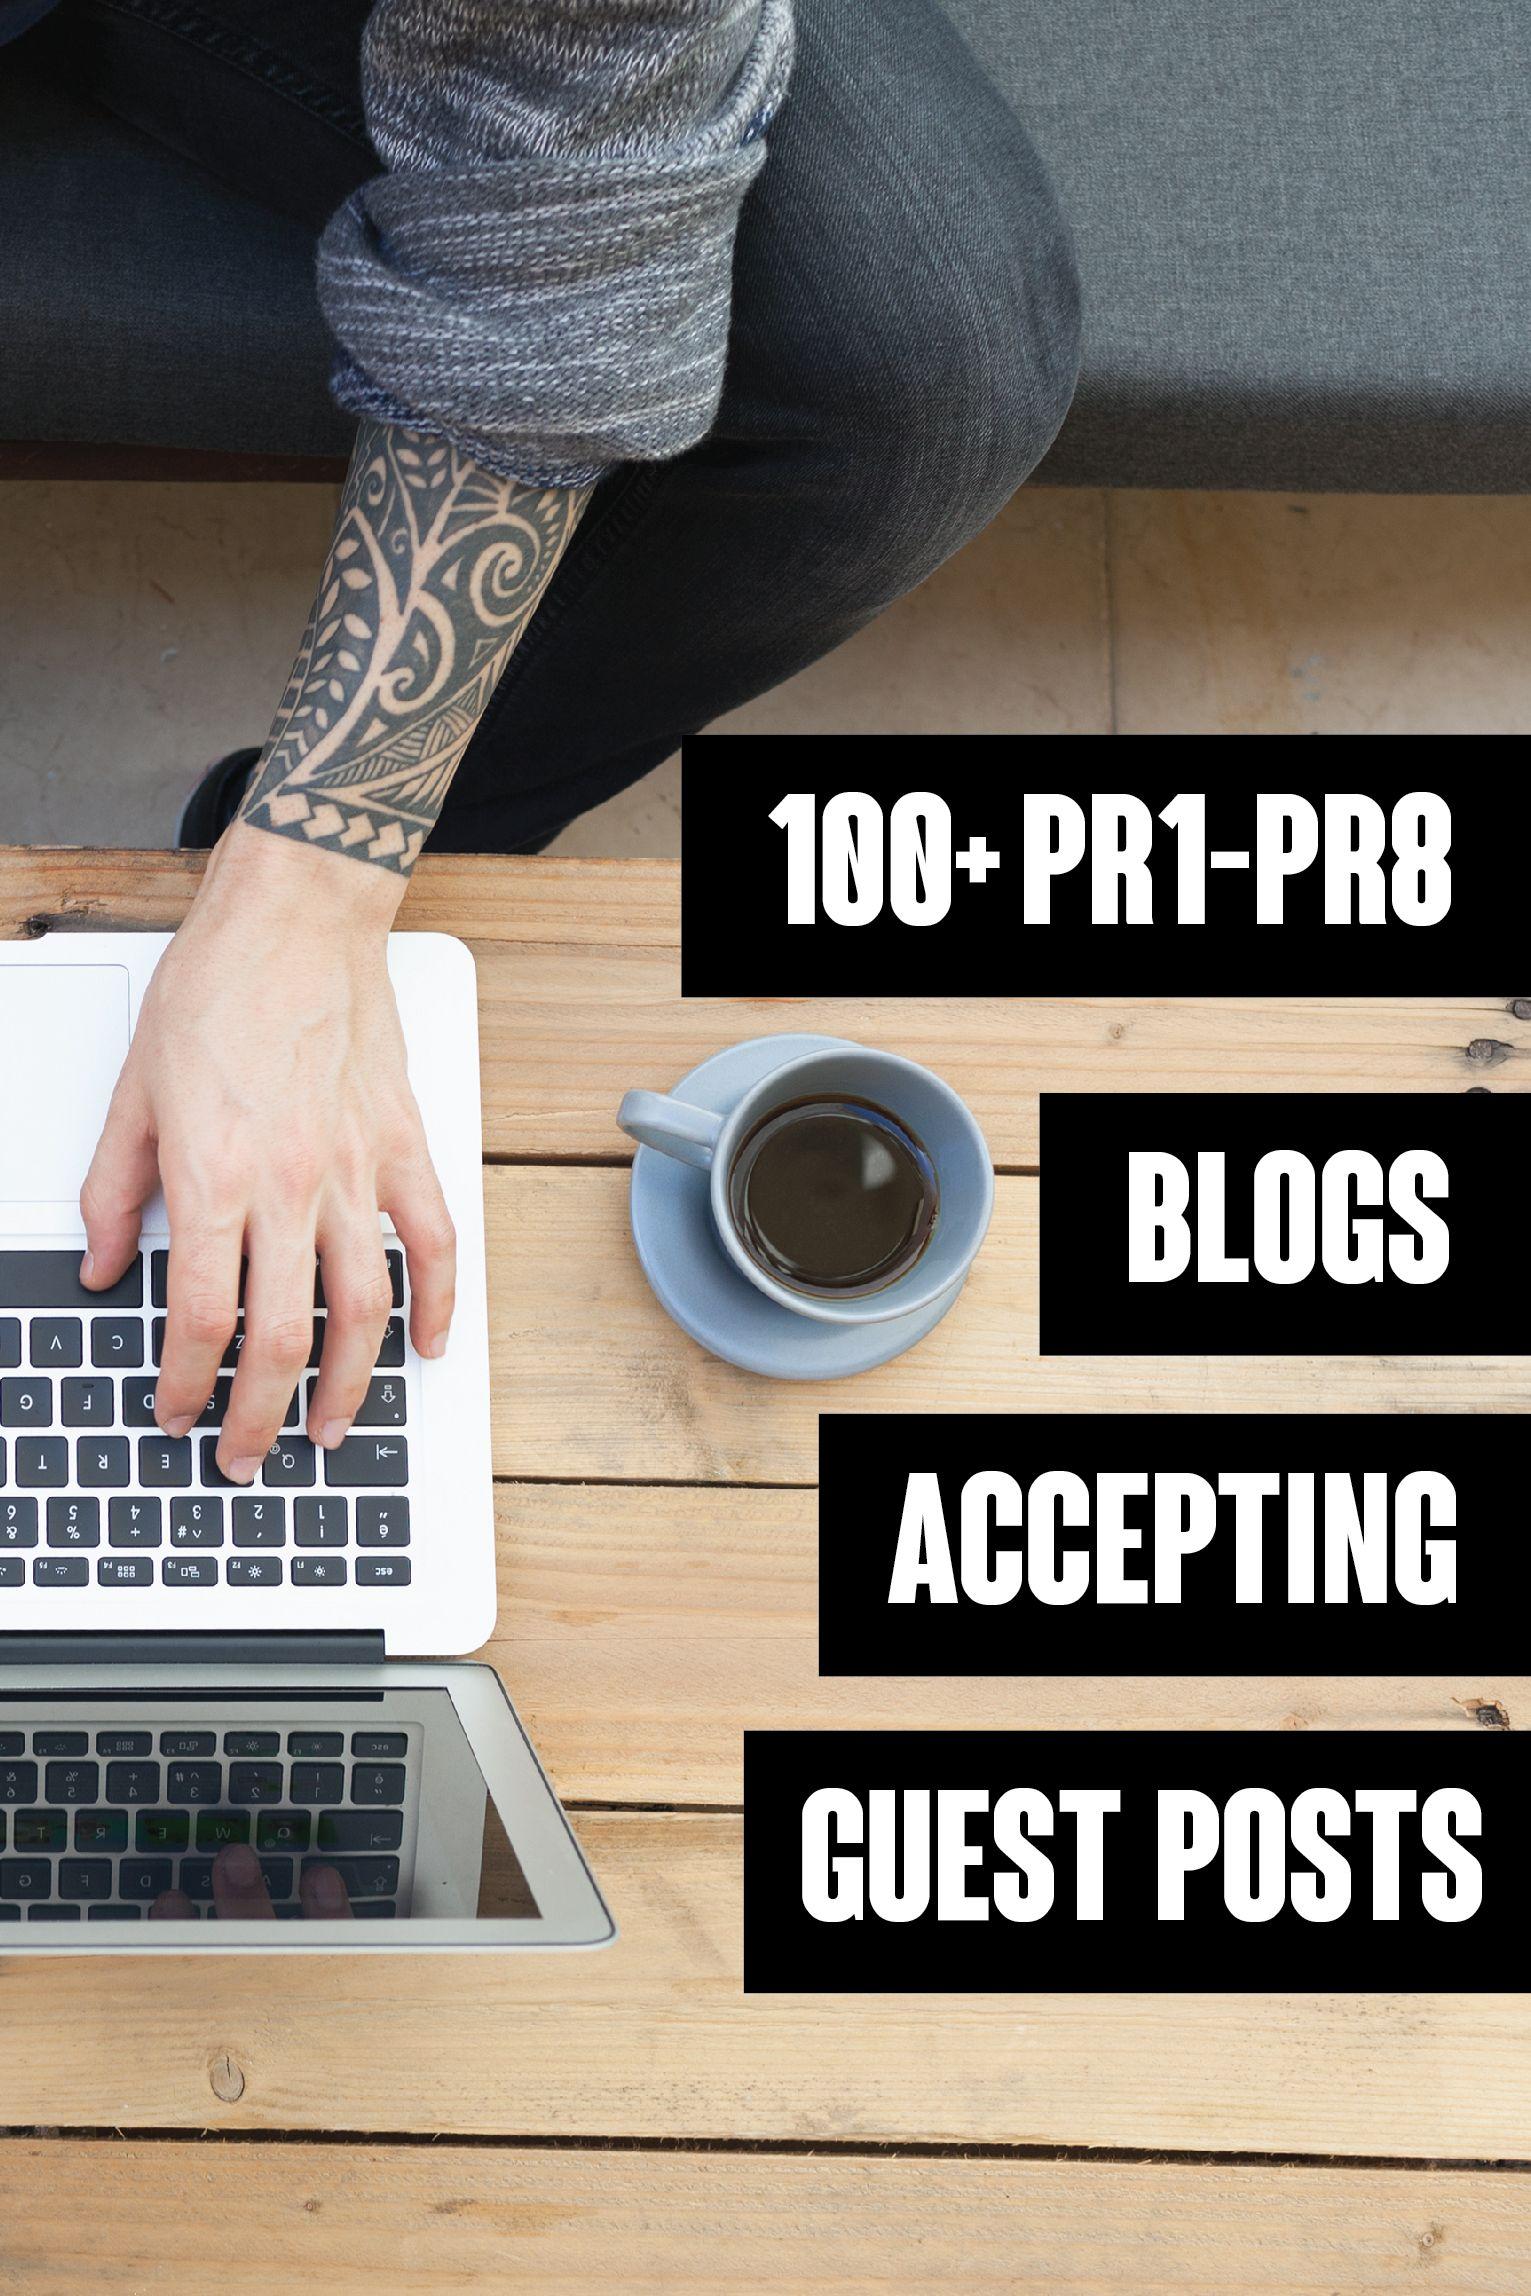 100+ PR1-PR8 Blogs Accepting Guest Posts | Blogging Tips + Tricks